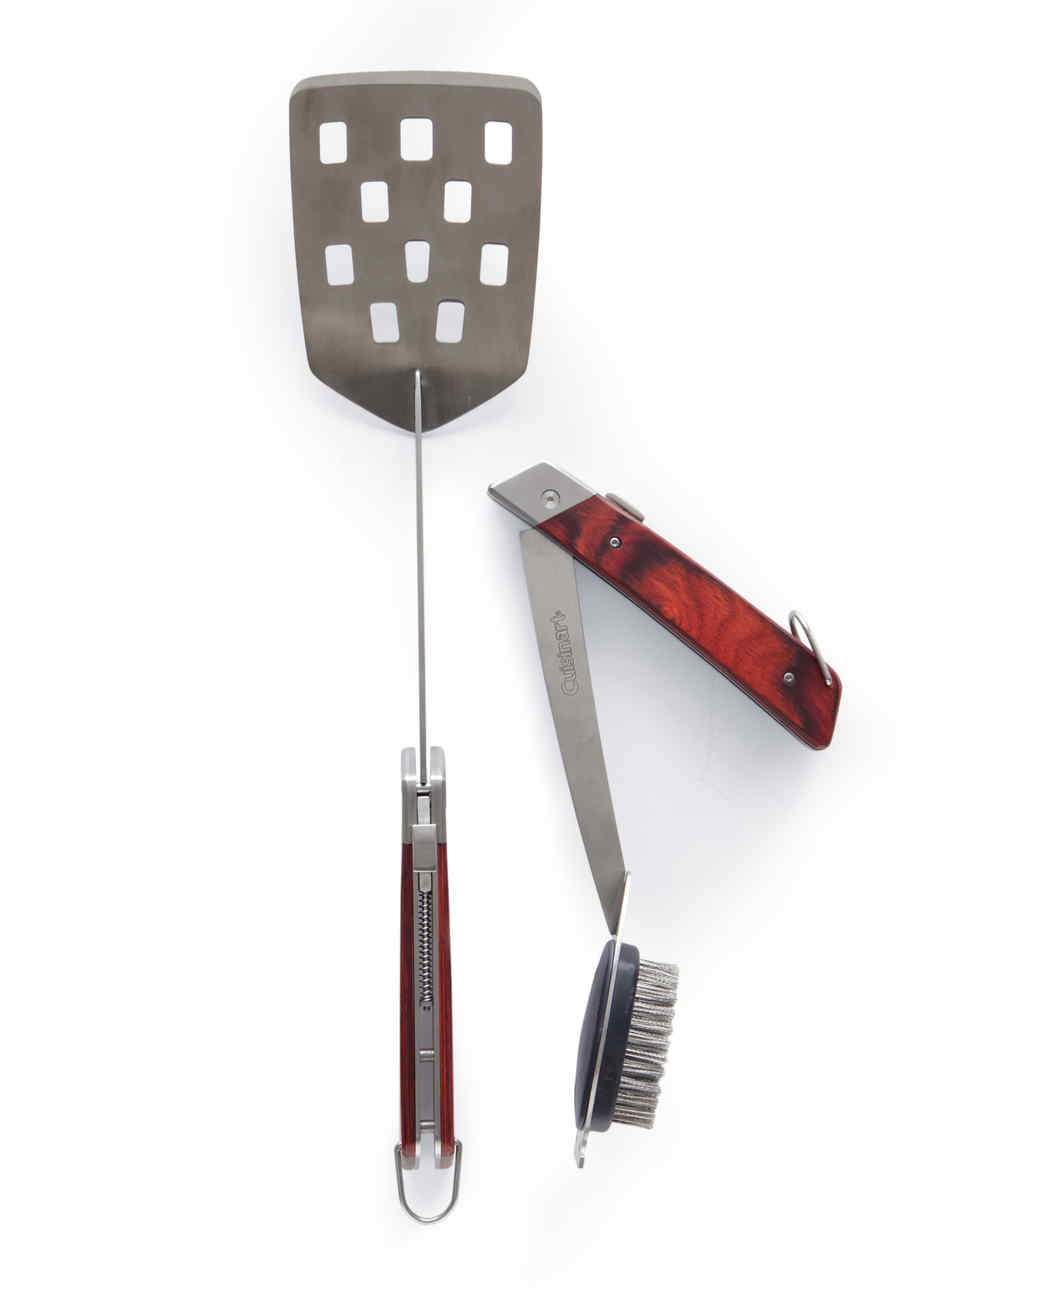 tools-04-0611mld107262.jpg